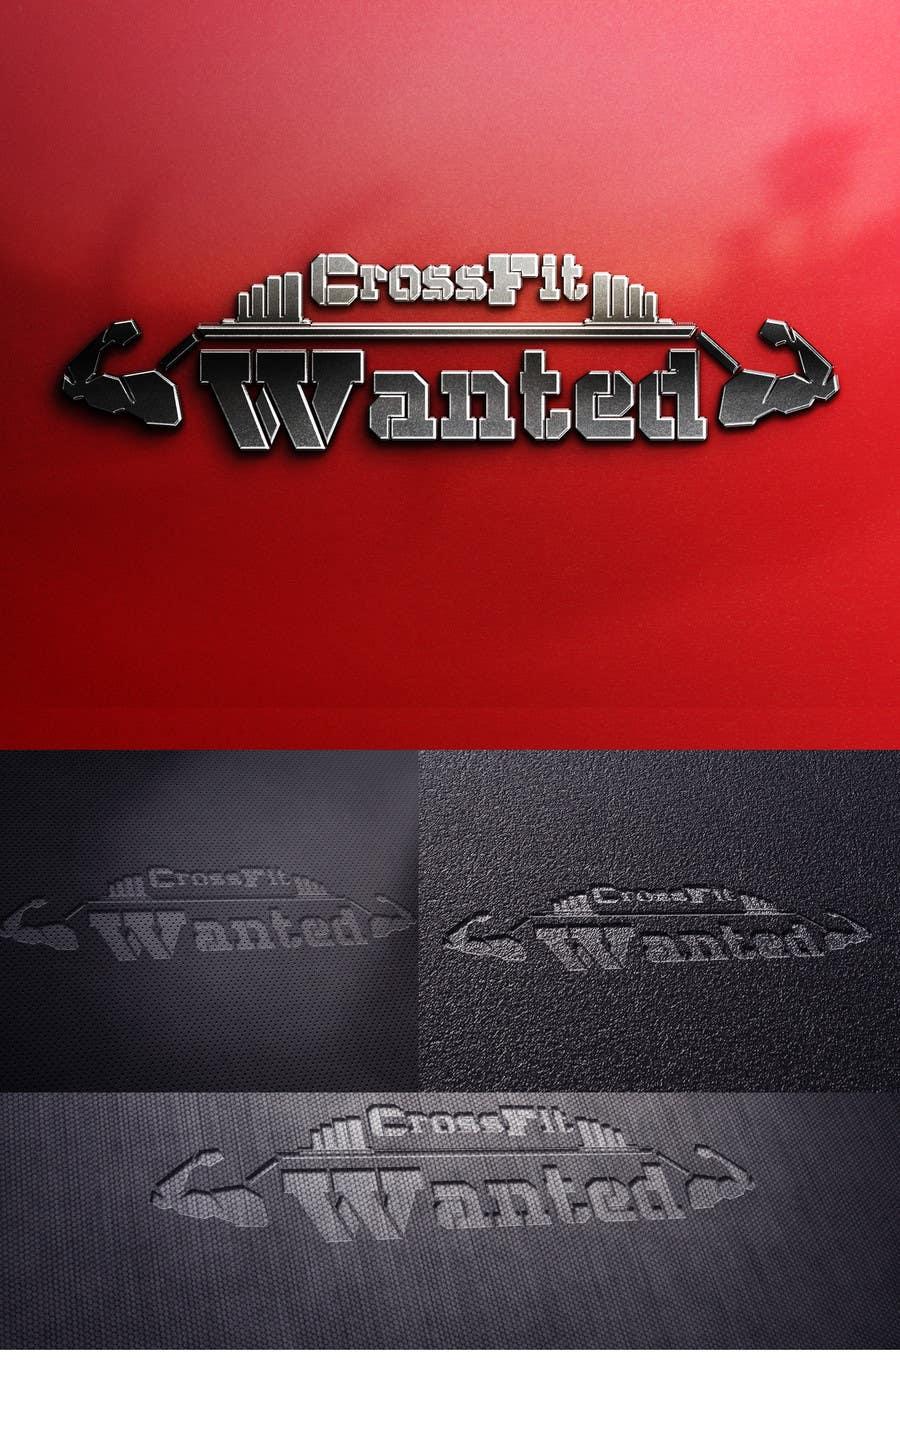 Bài tham dự cuộc thi #                                        120                                      cho                                         Design a Logo for CrossFit Wanted